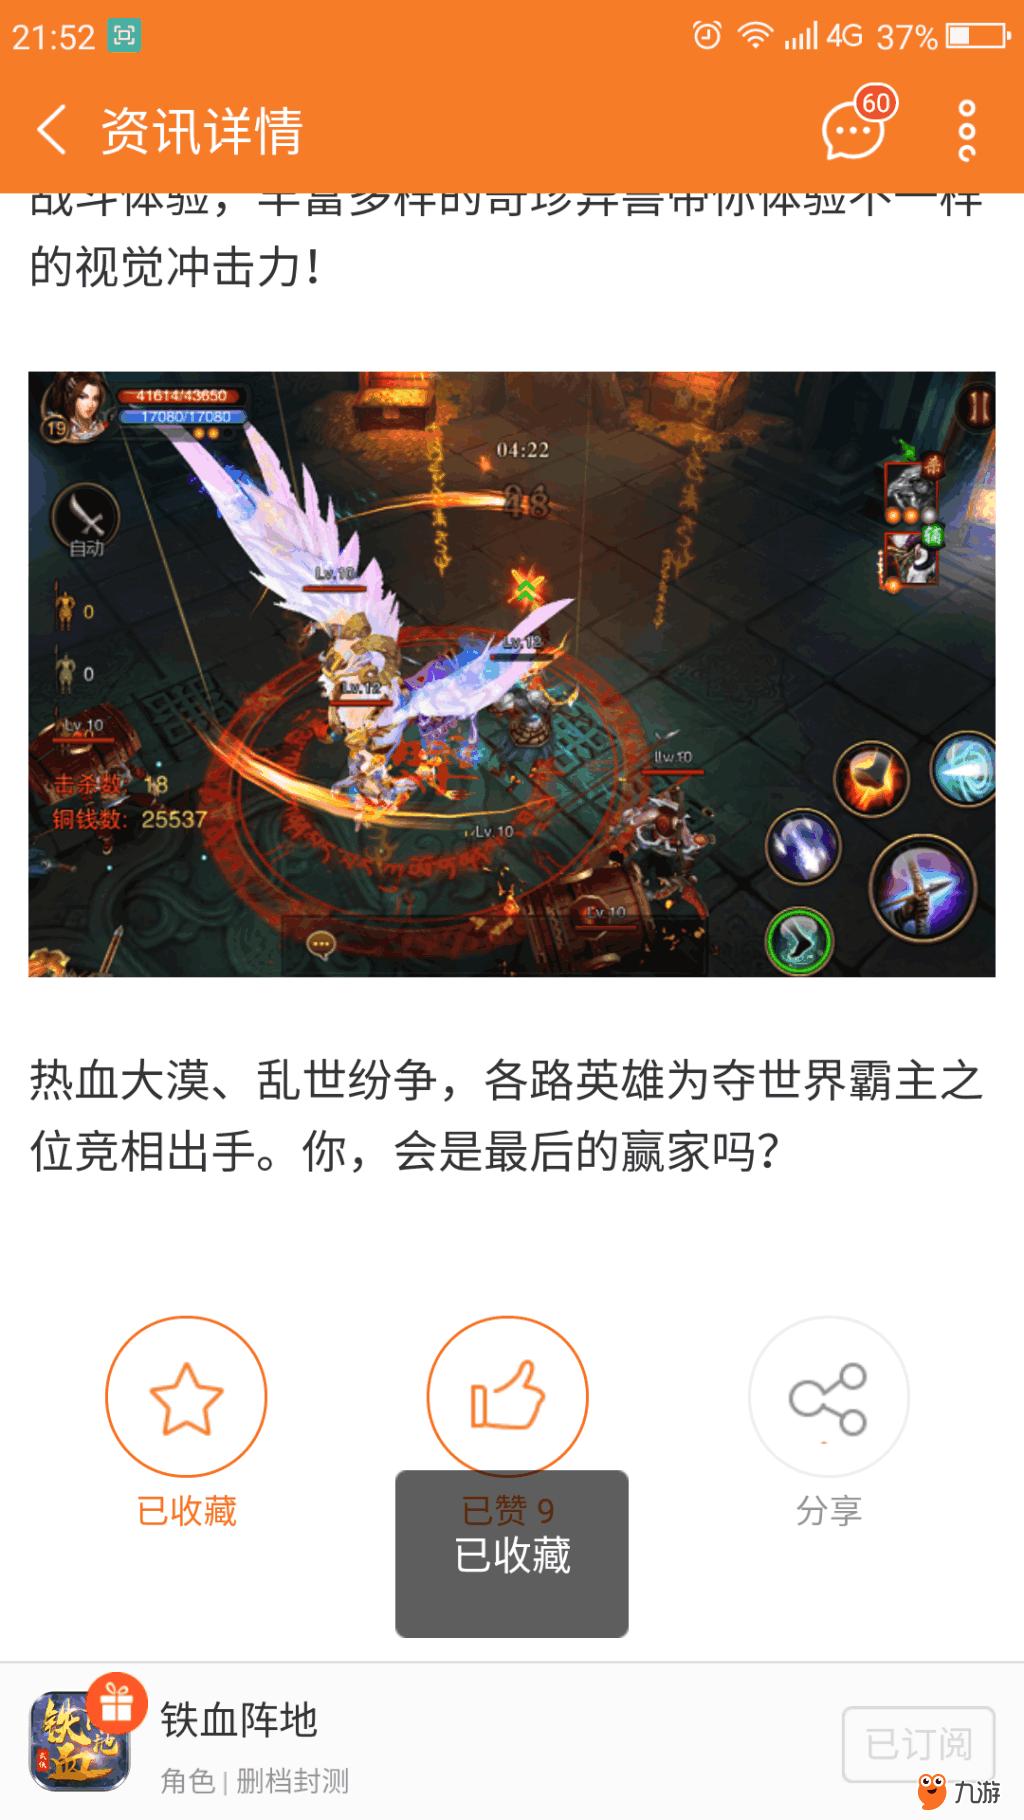 Screenshot_2018s07s15s21s52s34.png